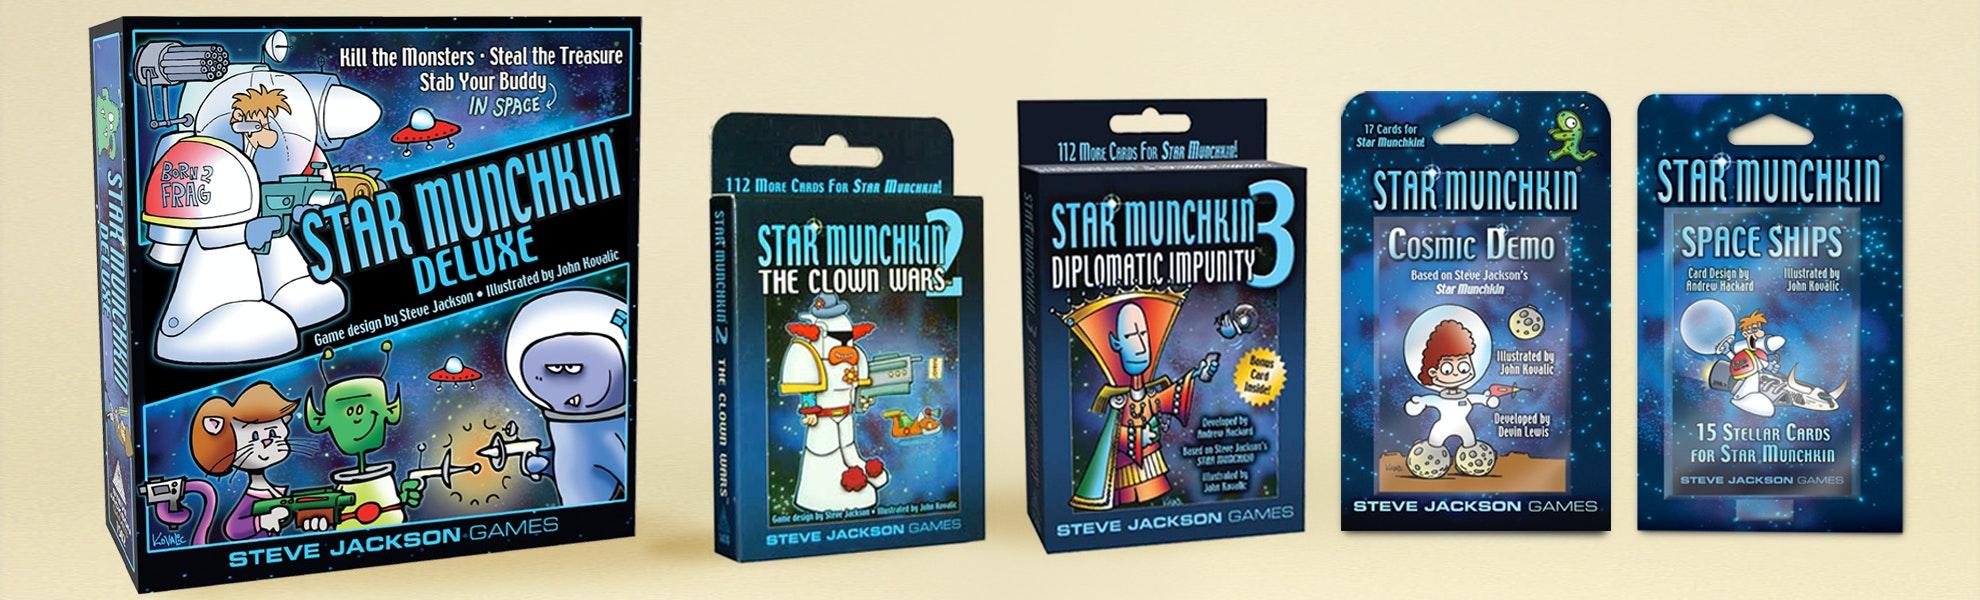 Star Munchkin Deluxe Bundle